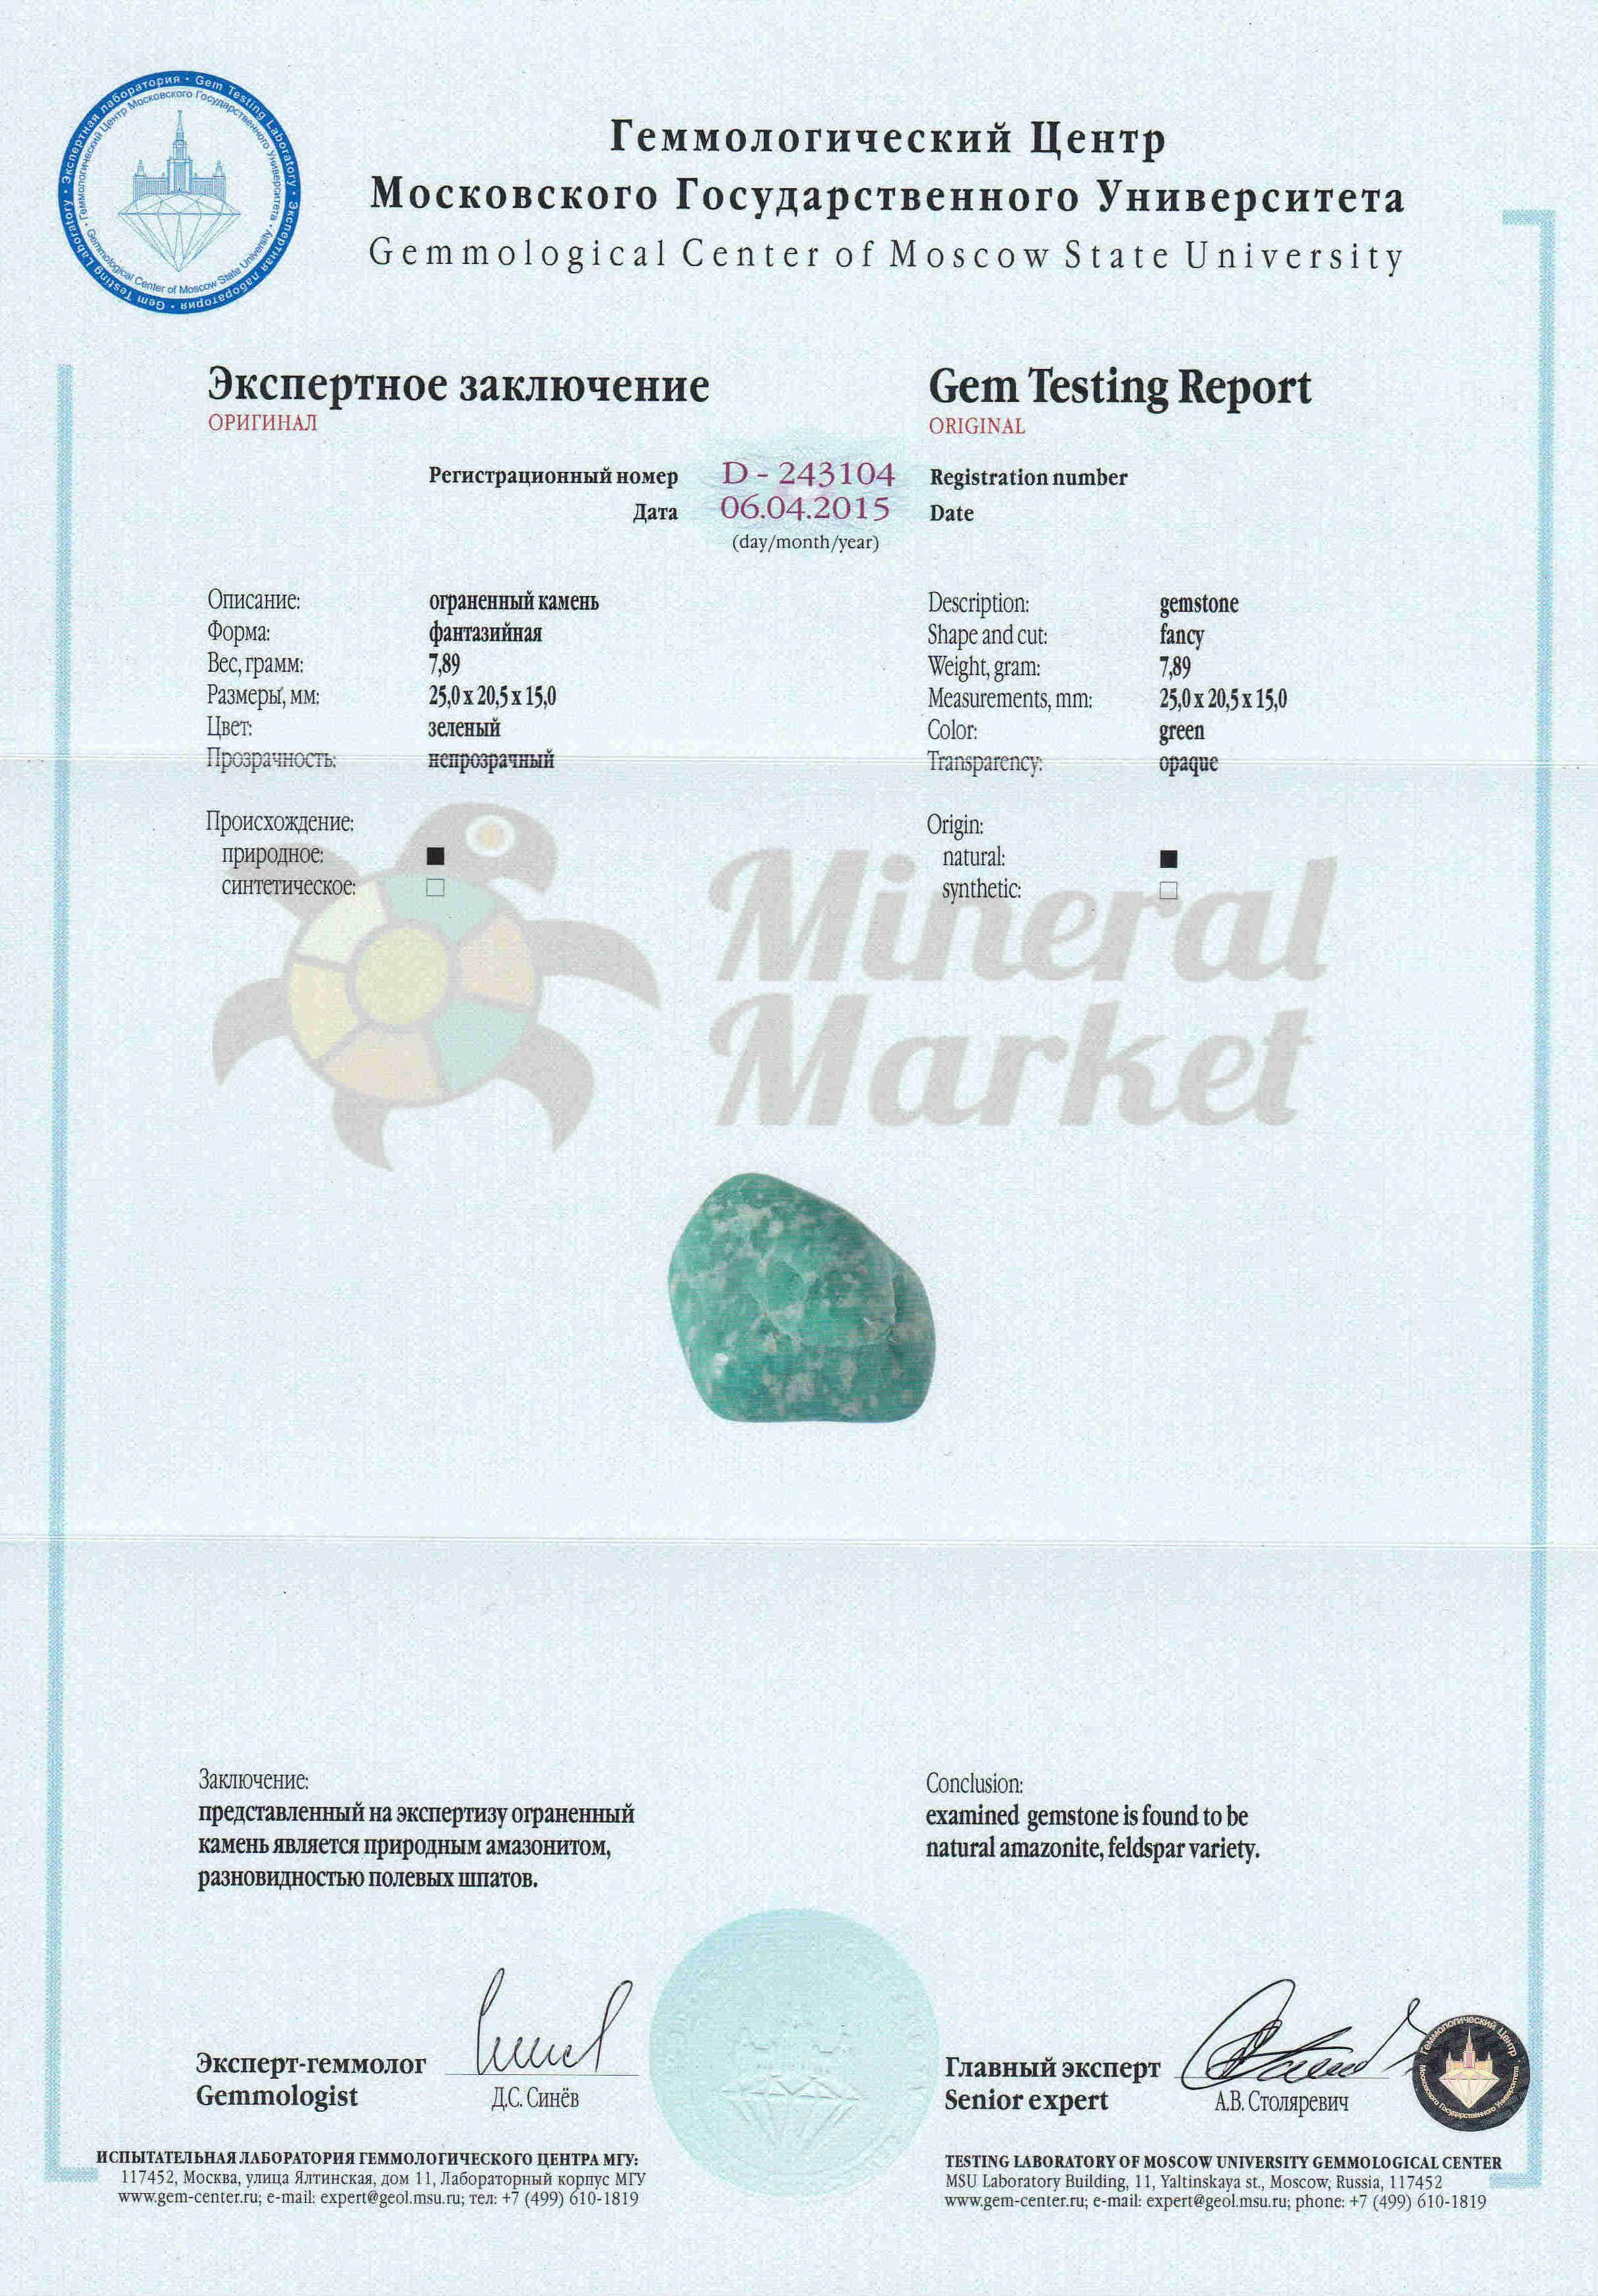 http://mineralmarket.ru/img/certificate/7.jpg